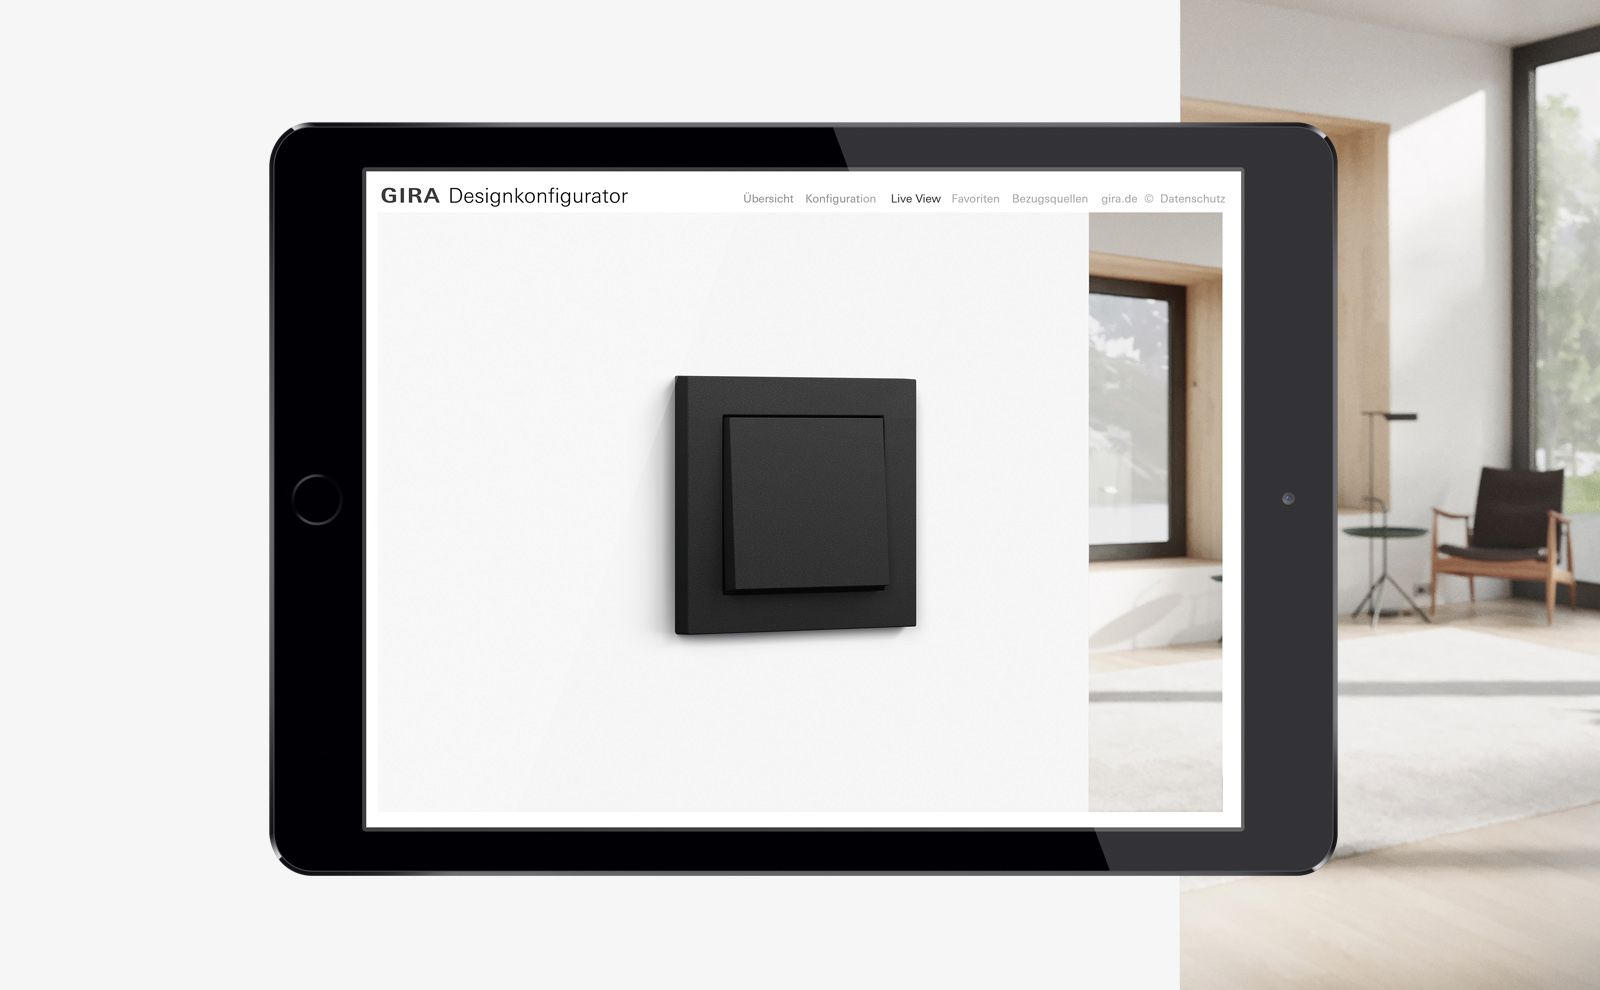 Gira Designkonfigurator